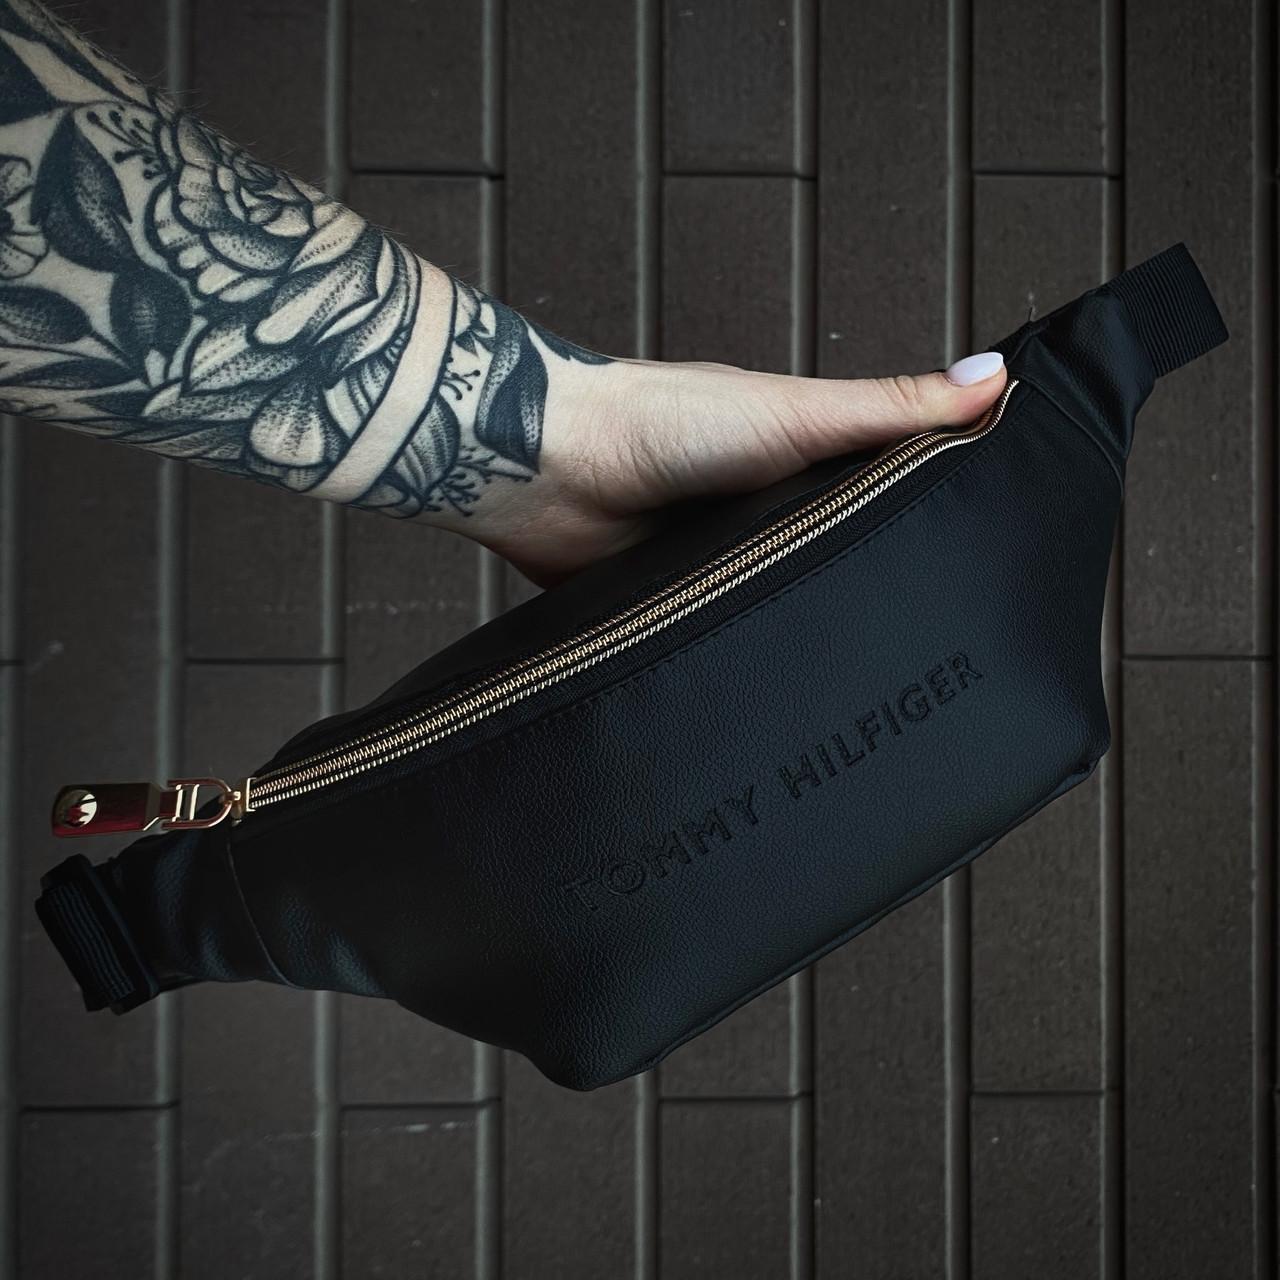 Бананка Tommy Hilfiger, сумка через плечо кожзам черная